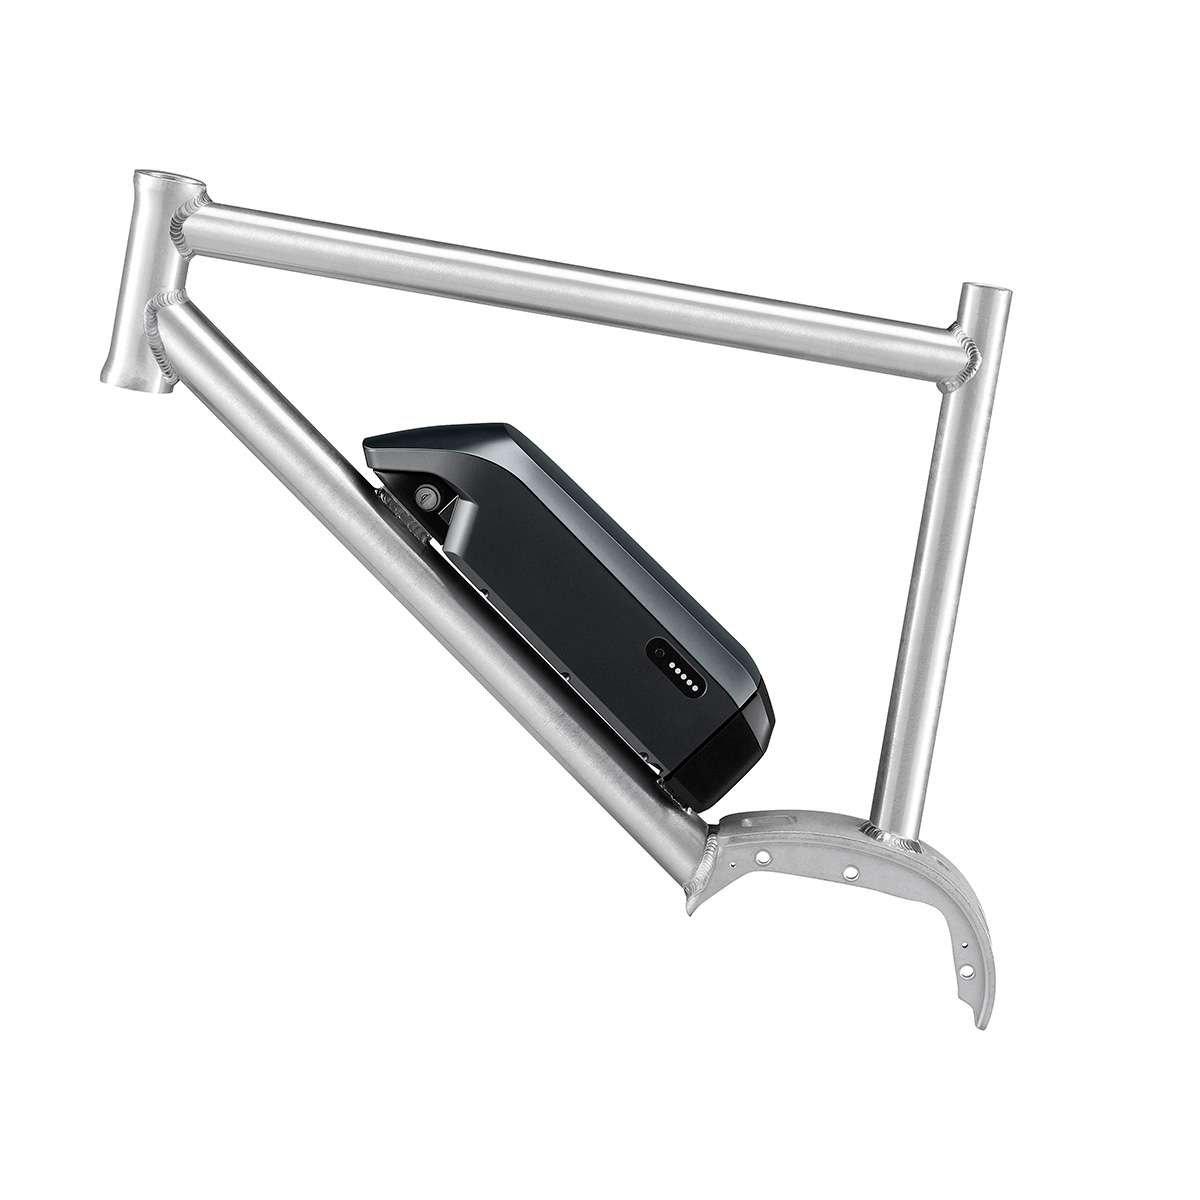 Shimano STePS E6000 E-Bicycle Battery - BT-E6010 - IBTE6010GC